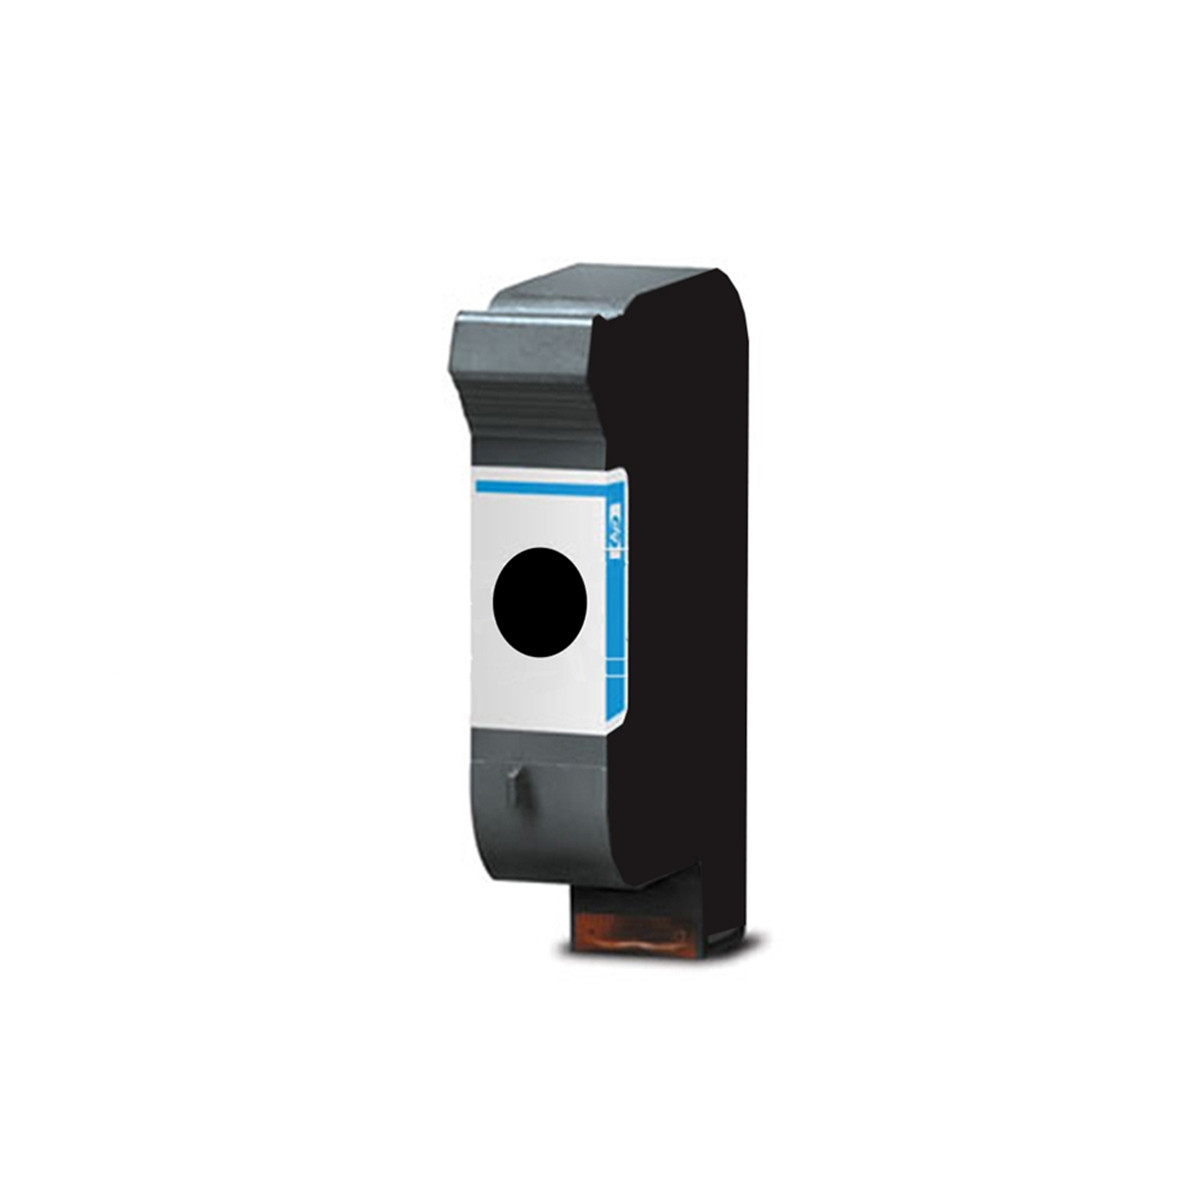 Cartucho de Tinta Compatível com HP 15 C6615NL Preto | Deskjet 710C PSC-500 Deskjet 810C | 38ml